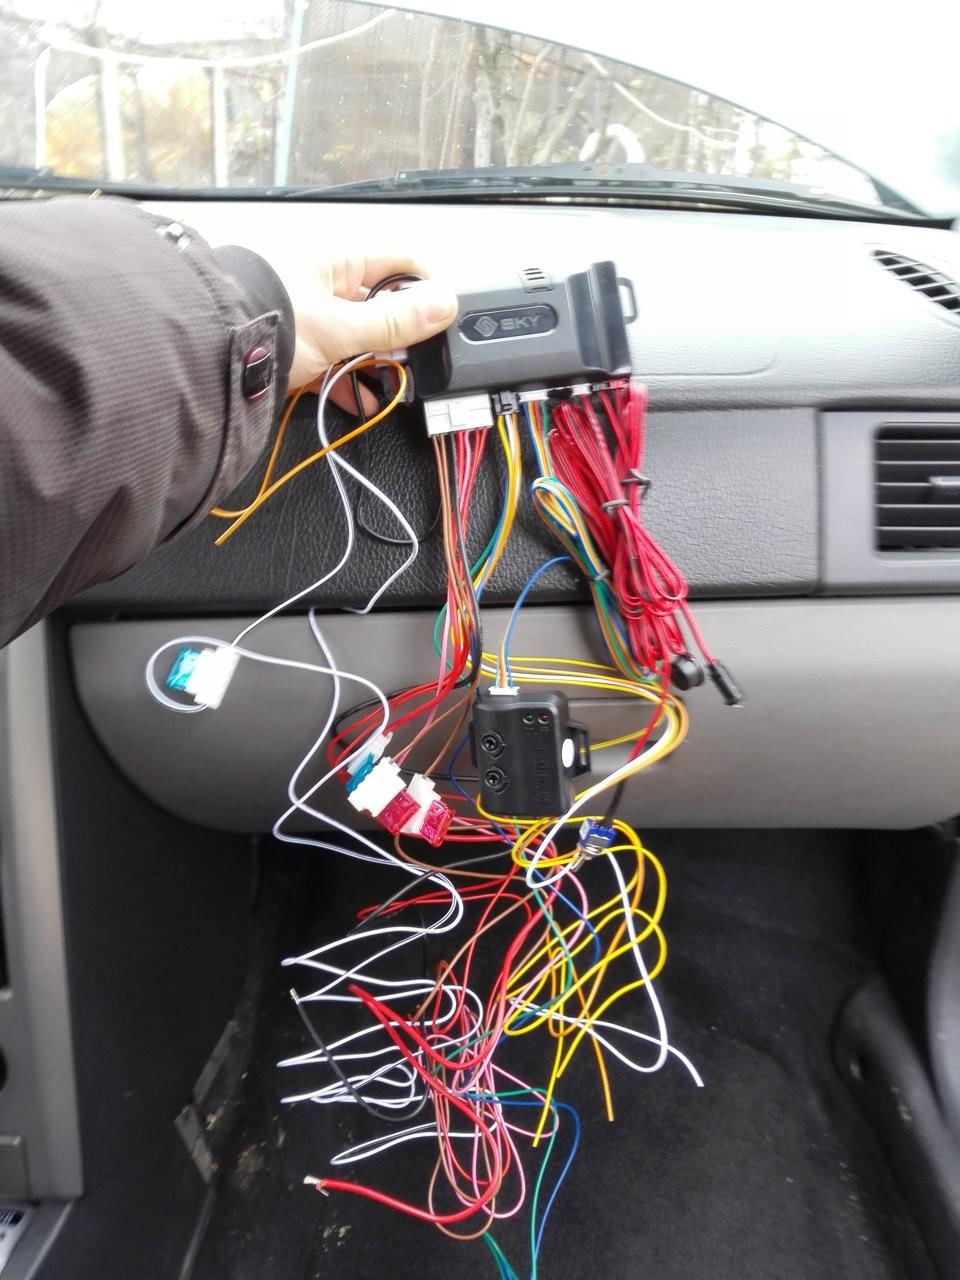 Установка автосигнализации sky m17 своими руками 18